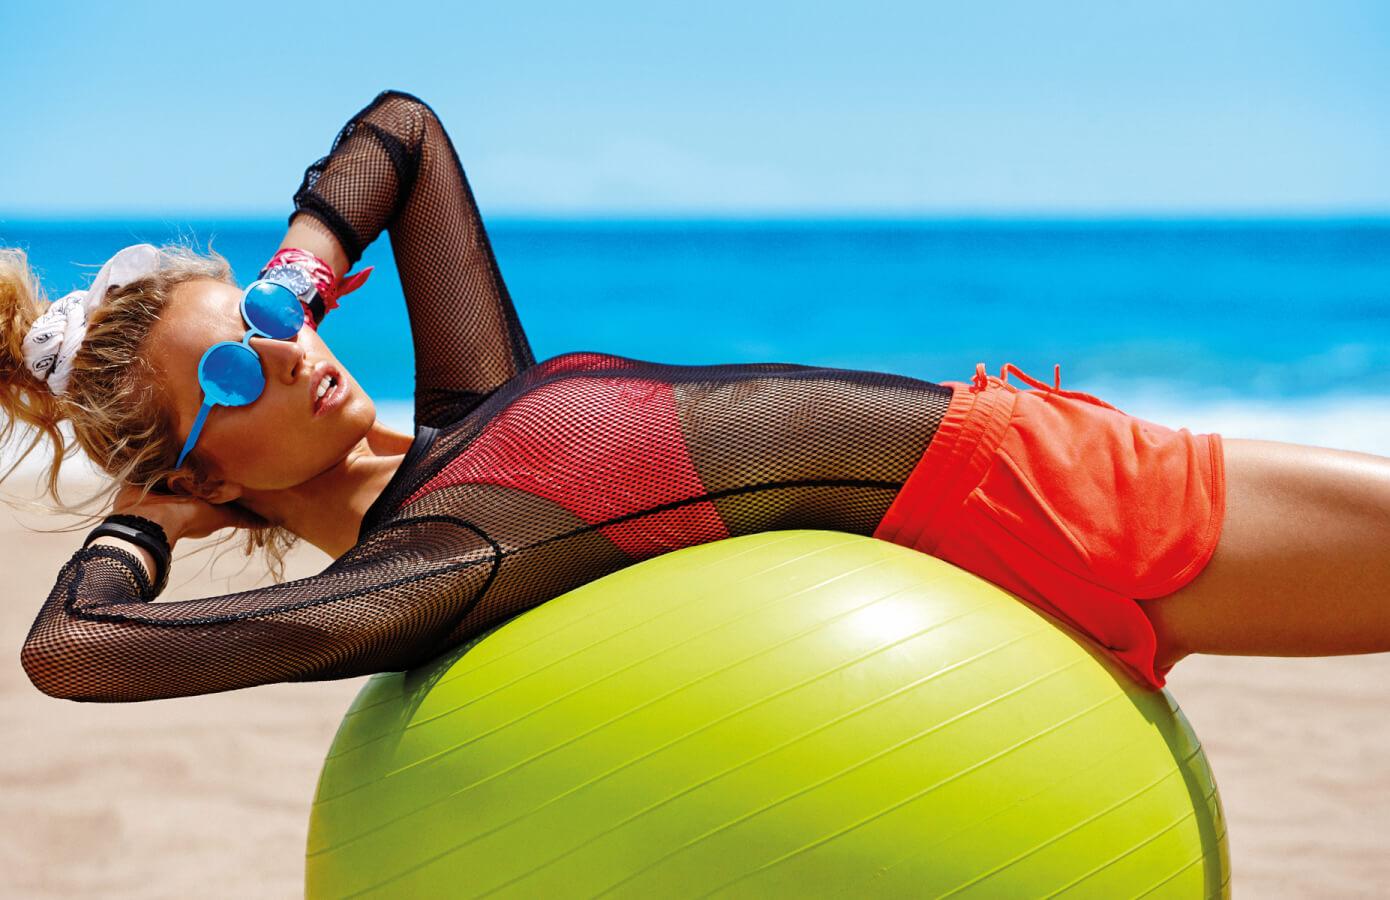 04_Alvaro_Beamud_Cortes_Vogue_Fitness